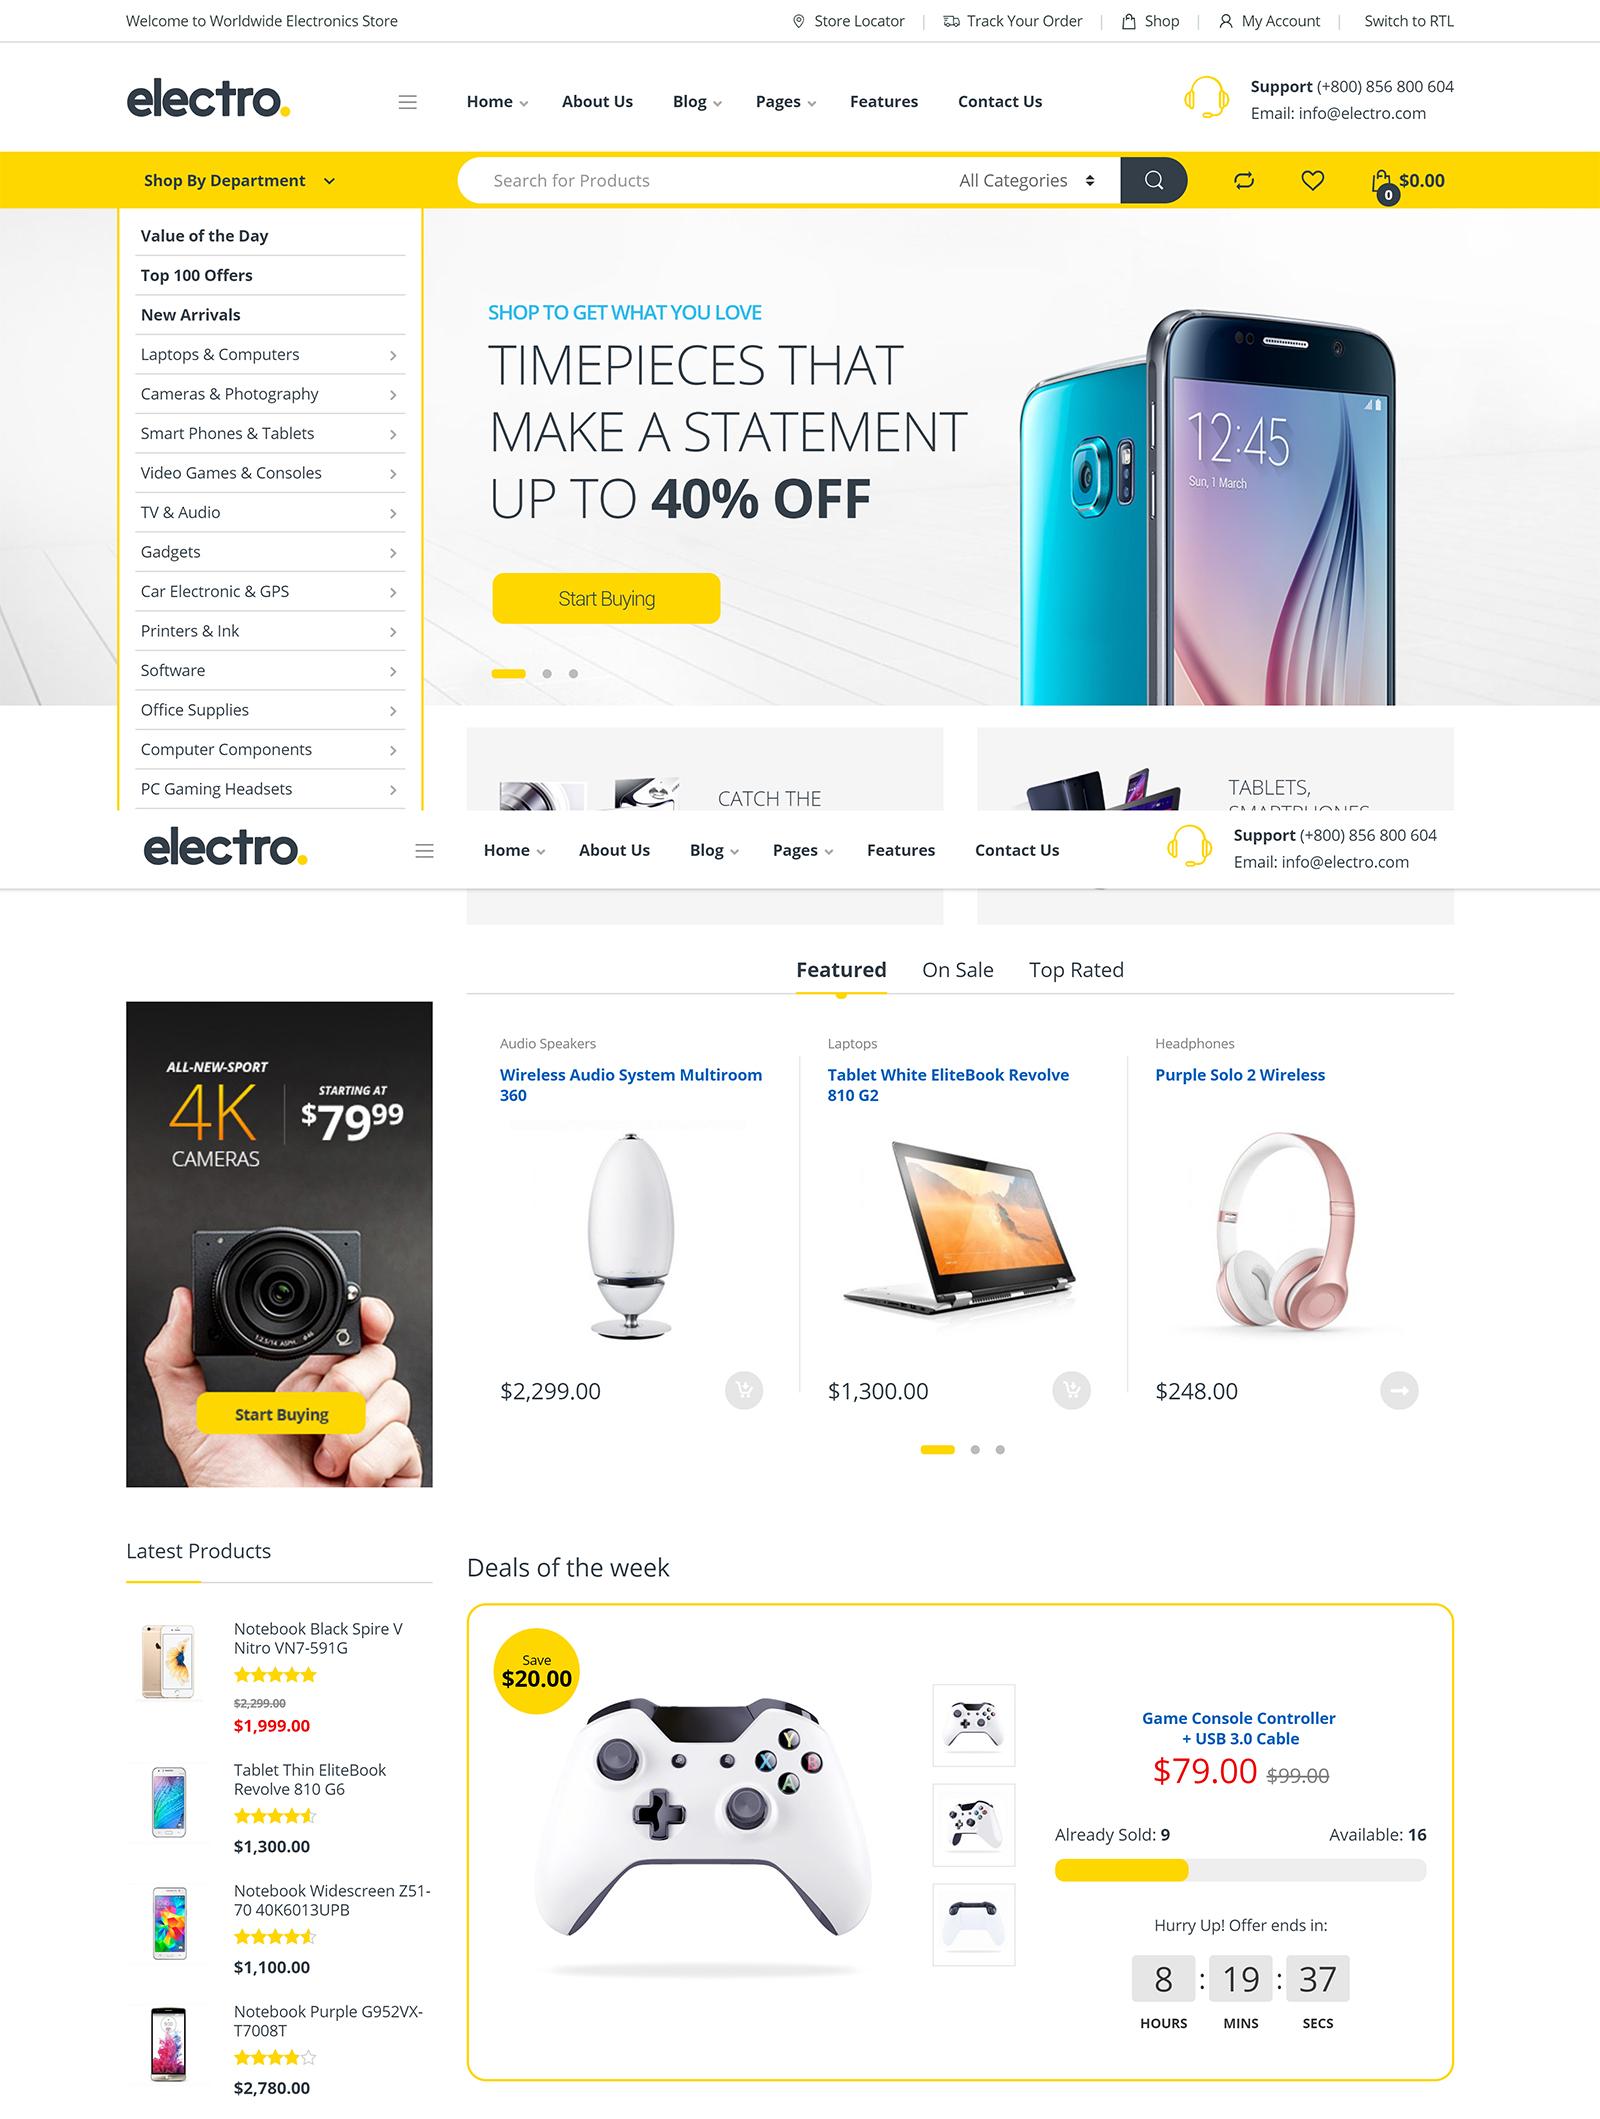 Electro Electronics Store WordPress Theme